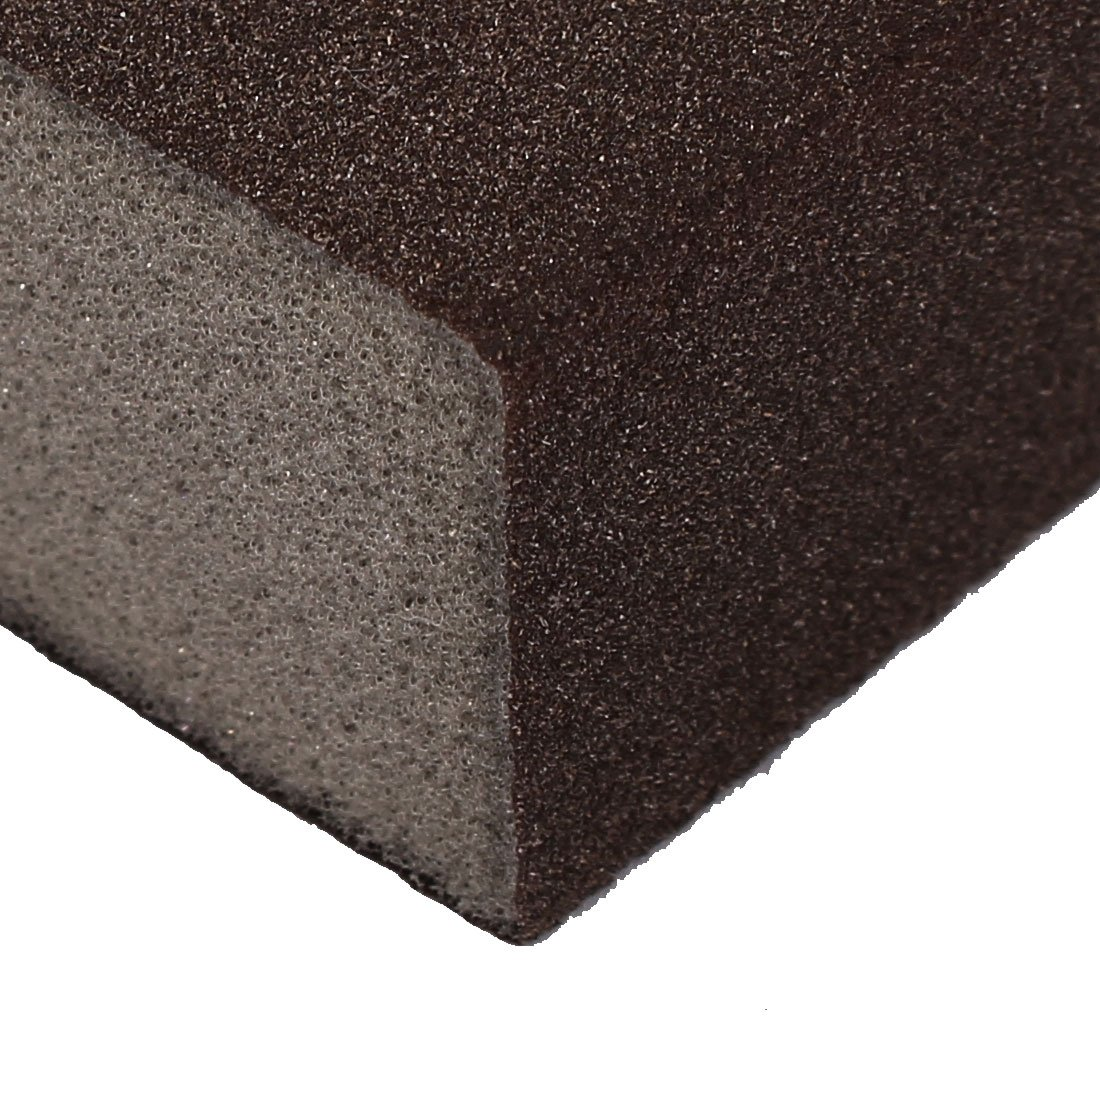 120mm x 98mm x12mm 180 Grit sourcing map Sanding Sponge Block